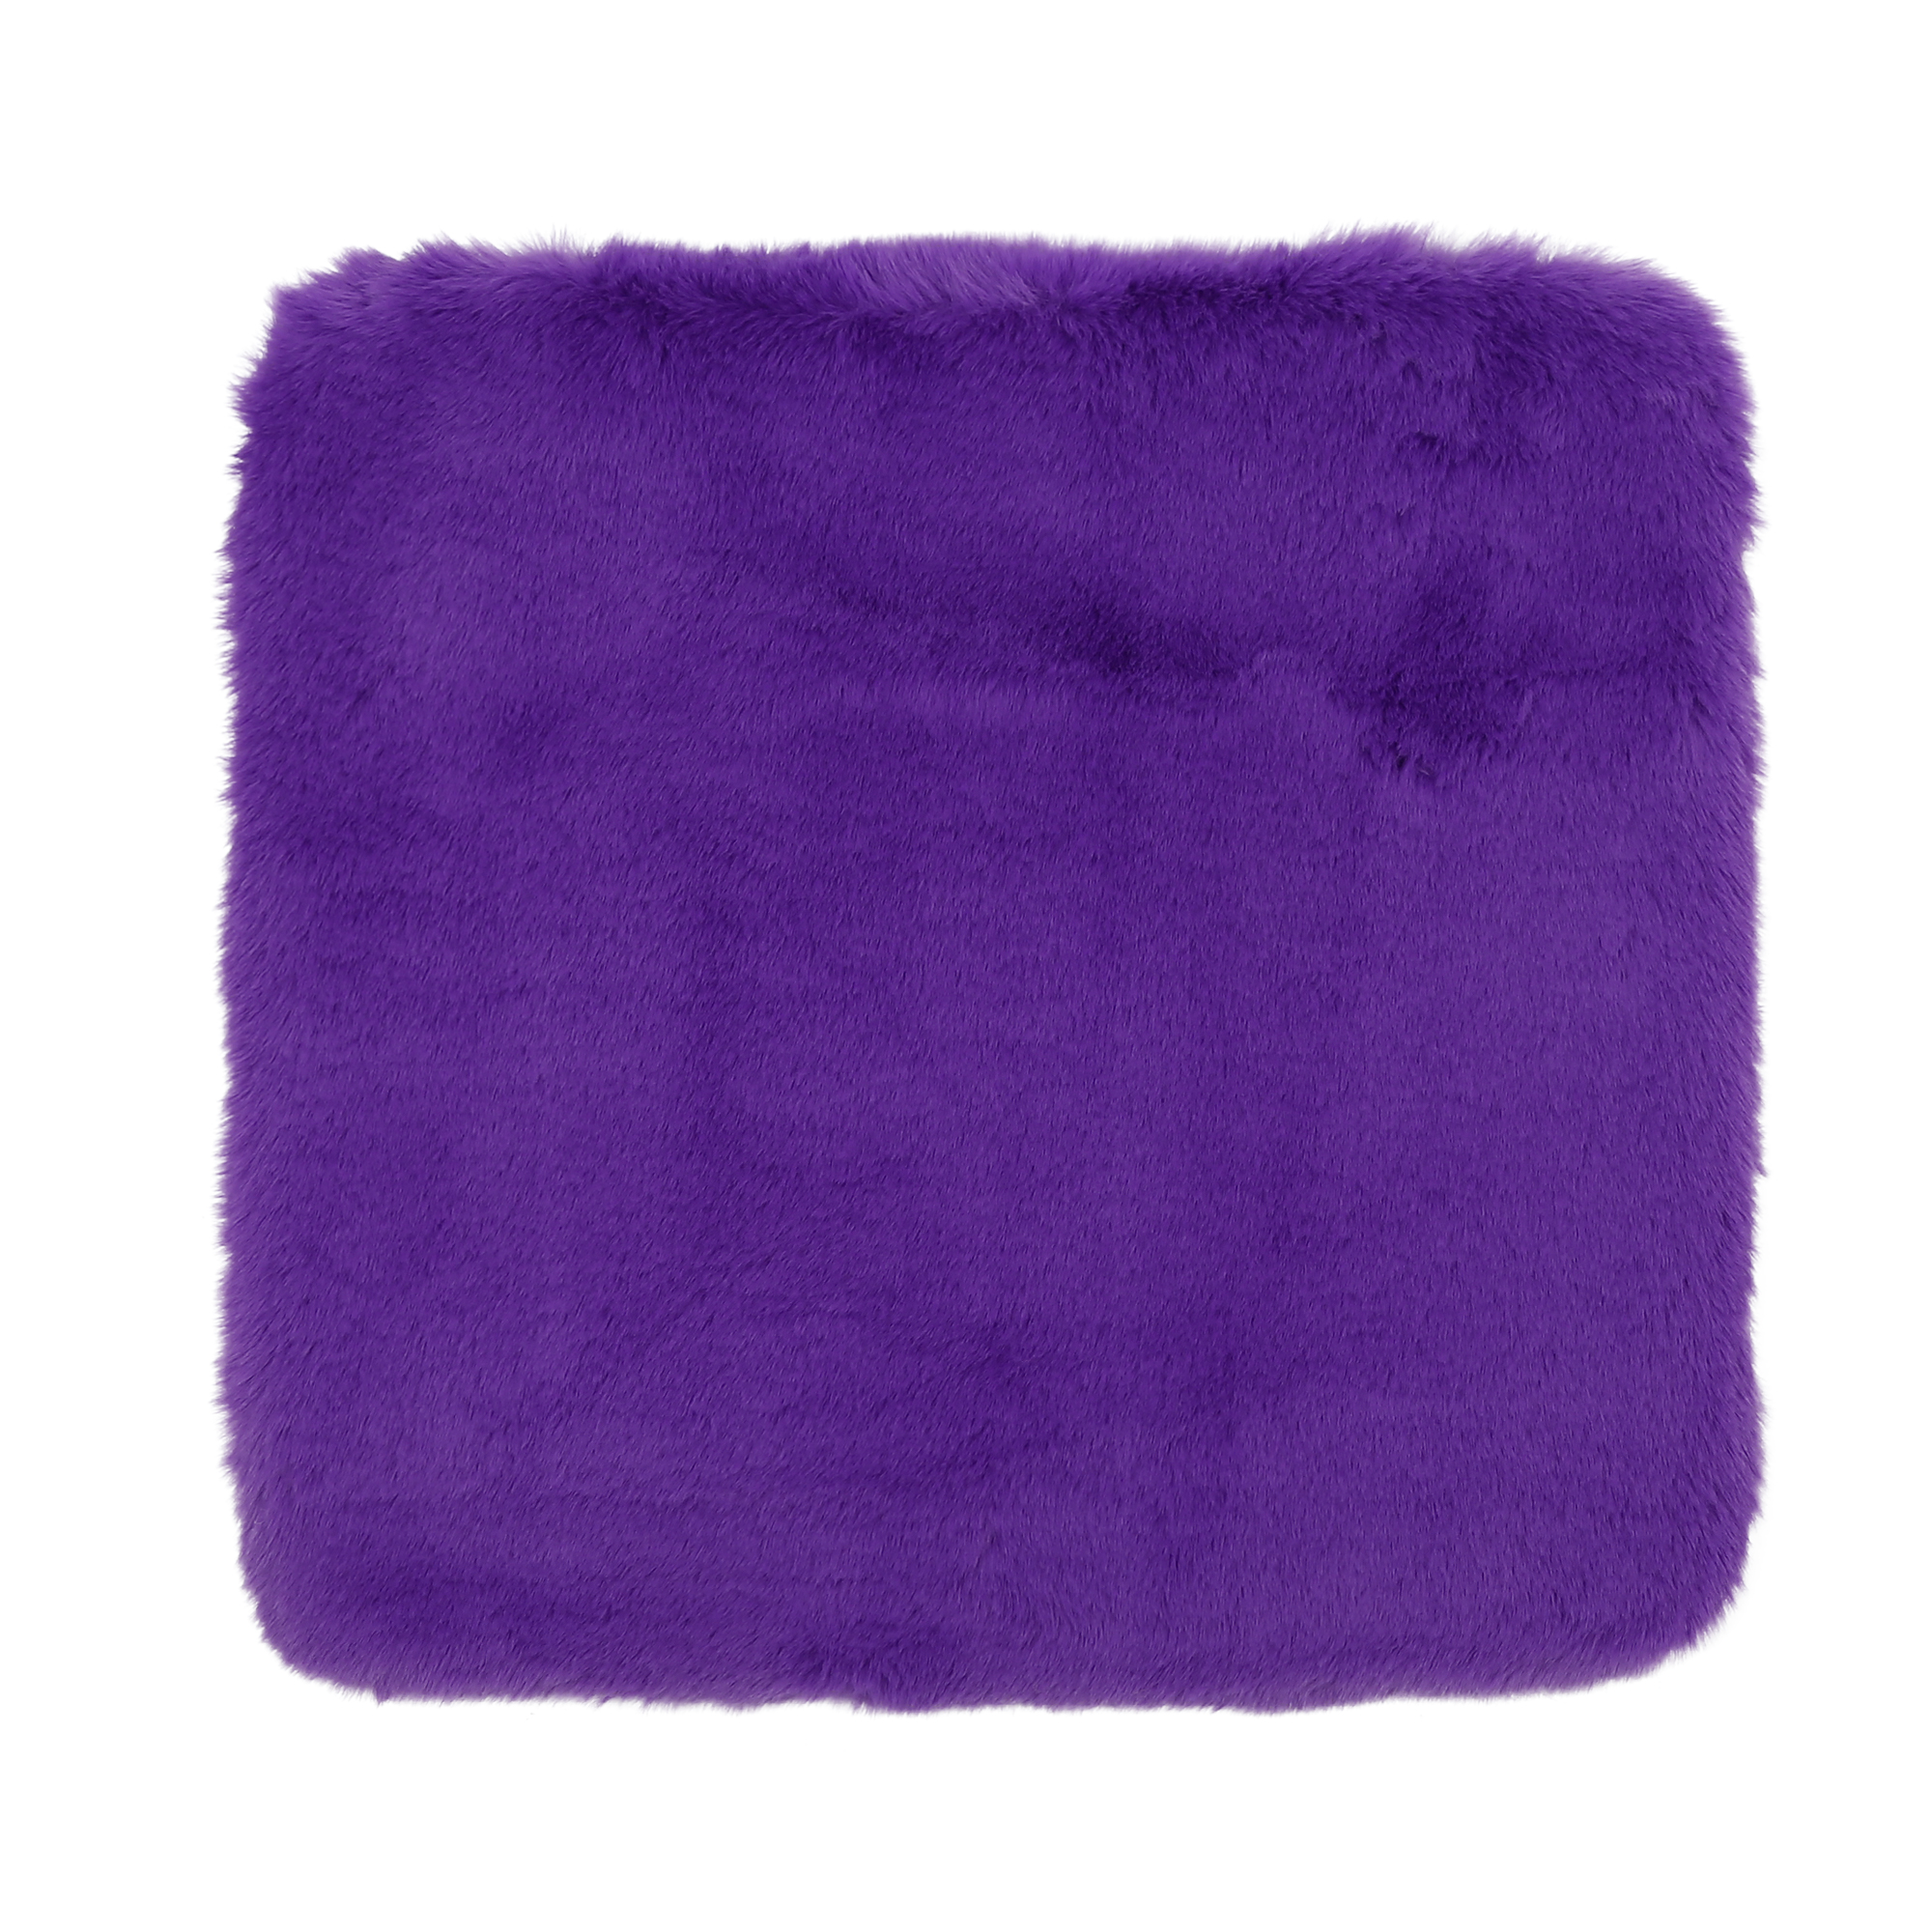 Universal Soft Faux Plush Cushion Warm Interior Seat Cover Pad for Auto Purple